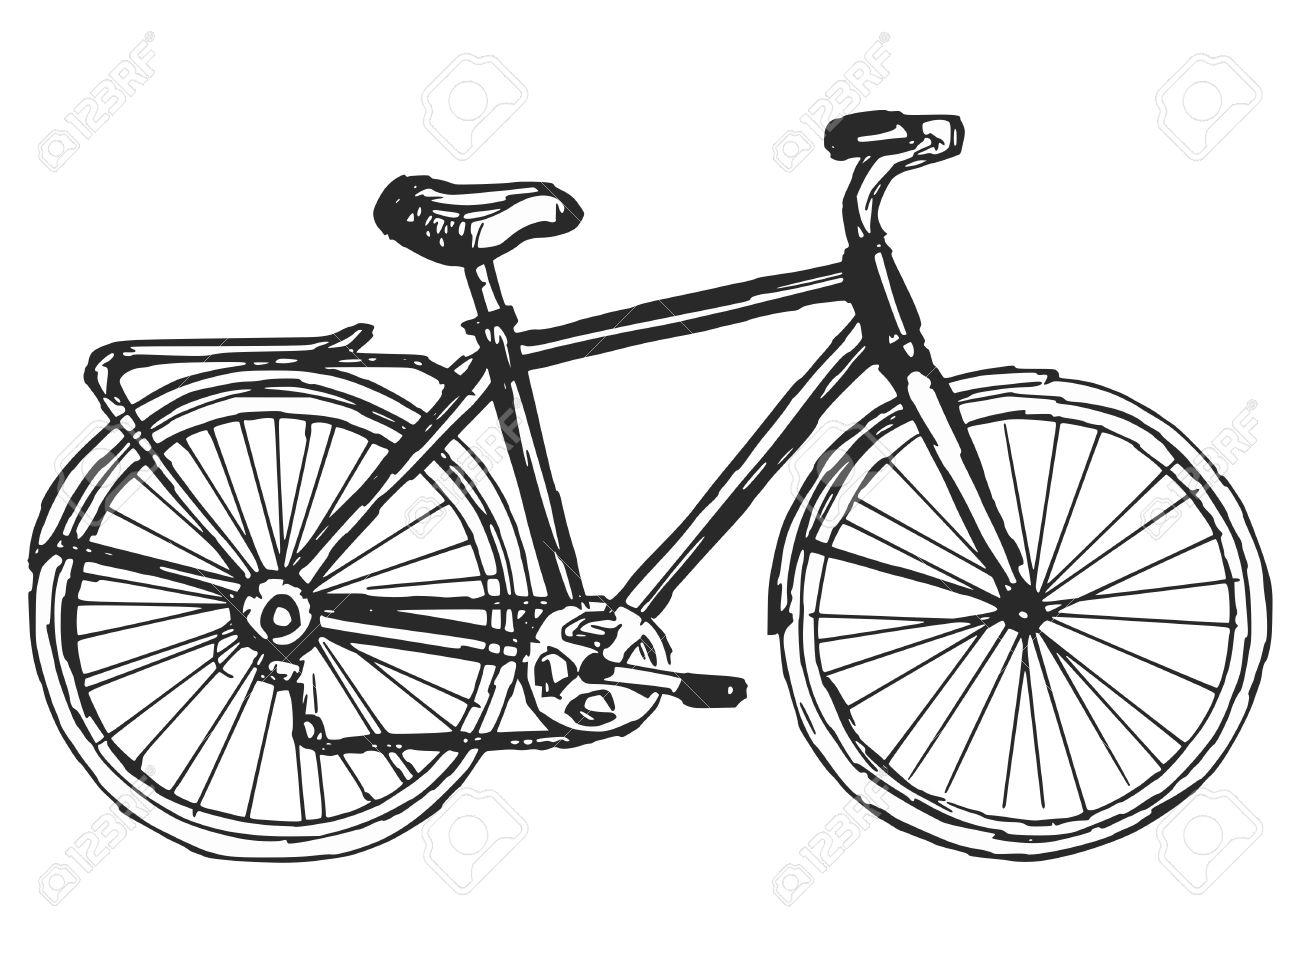 1300x974 Hand Drawn, Sketch, Cartoon Illustration Of Bicycle Royalty Free